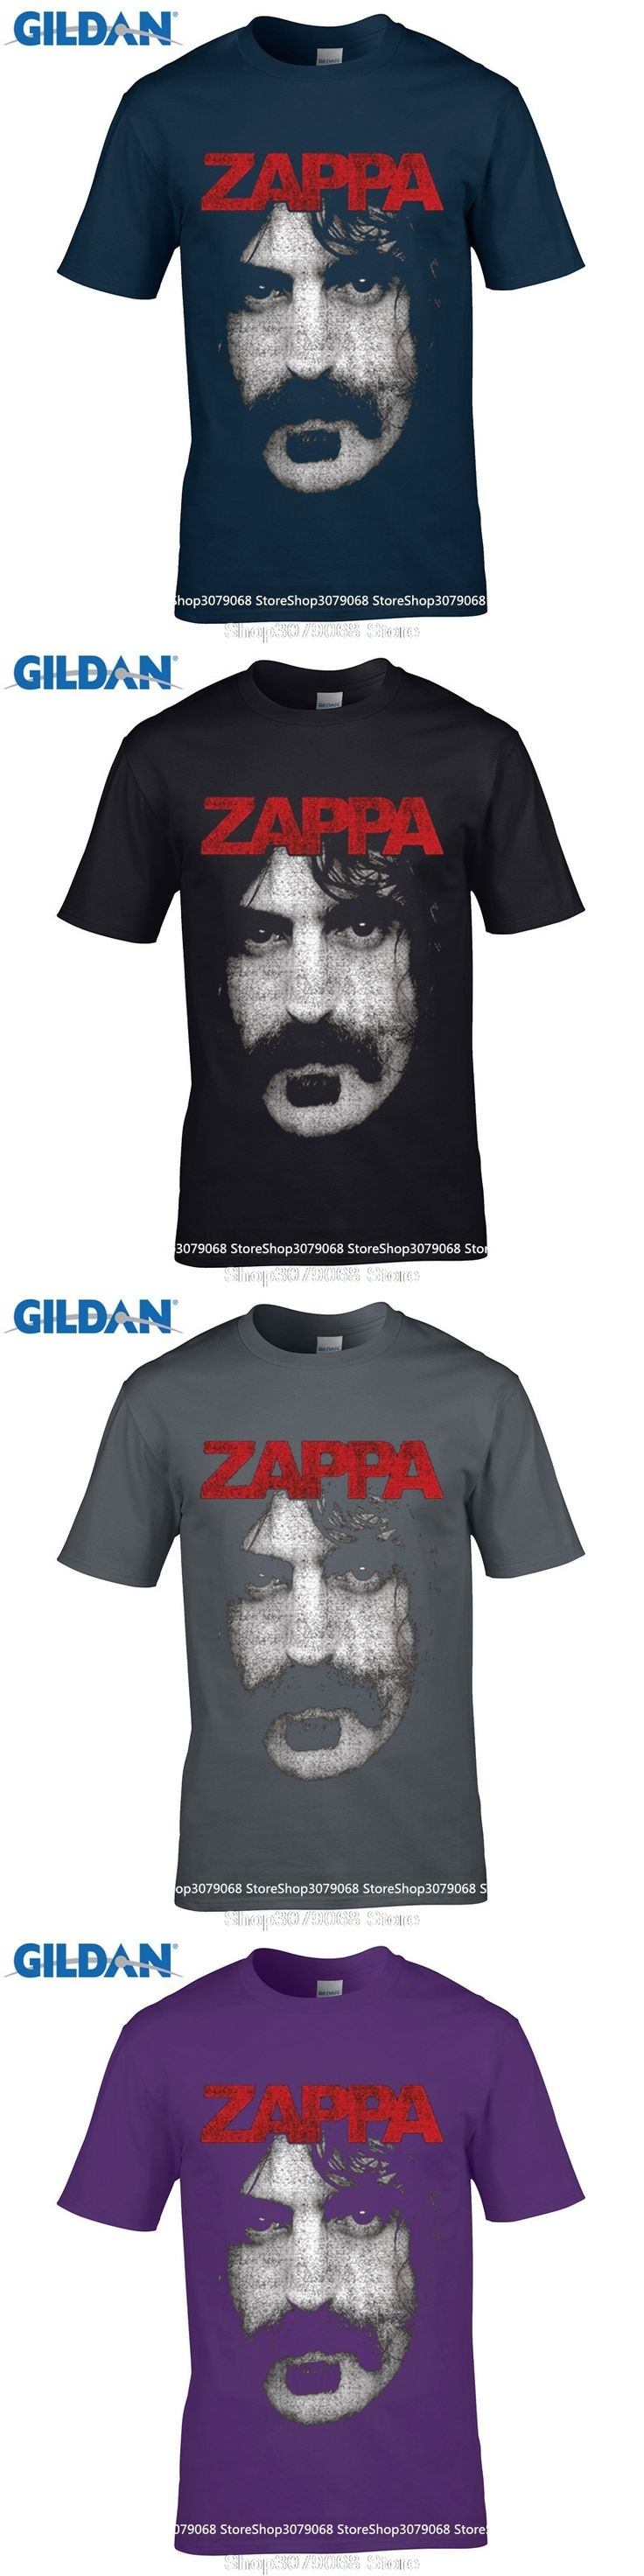 GILDAN Fashion T Shirts Summer Straight 100% Cotton Impact   Frank Zappa Photo Jersey T Shirt